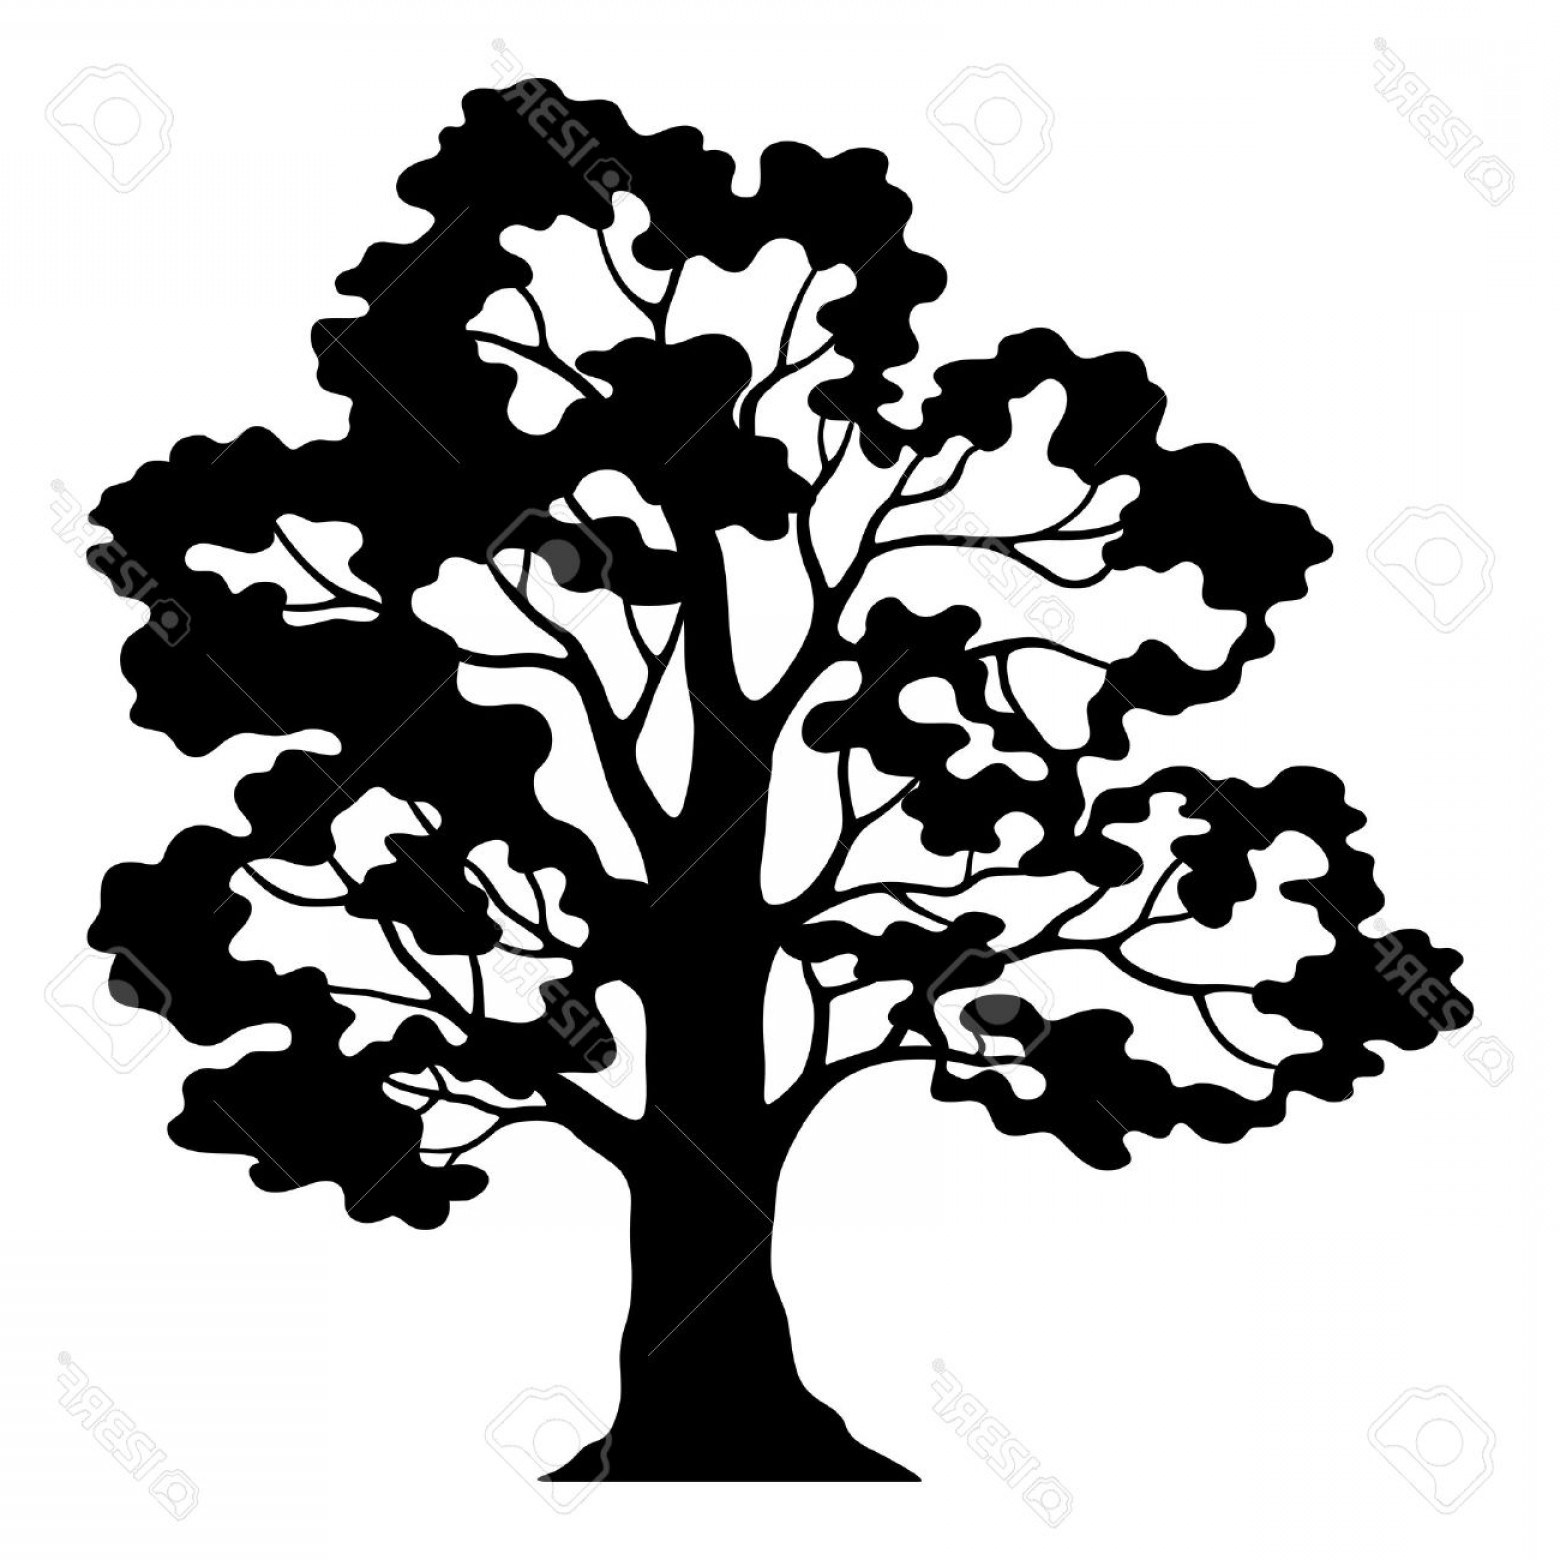 1560x1560 White Oak Leaf Outline Vector Lazttweet